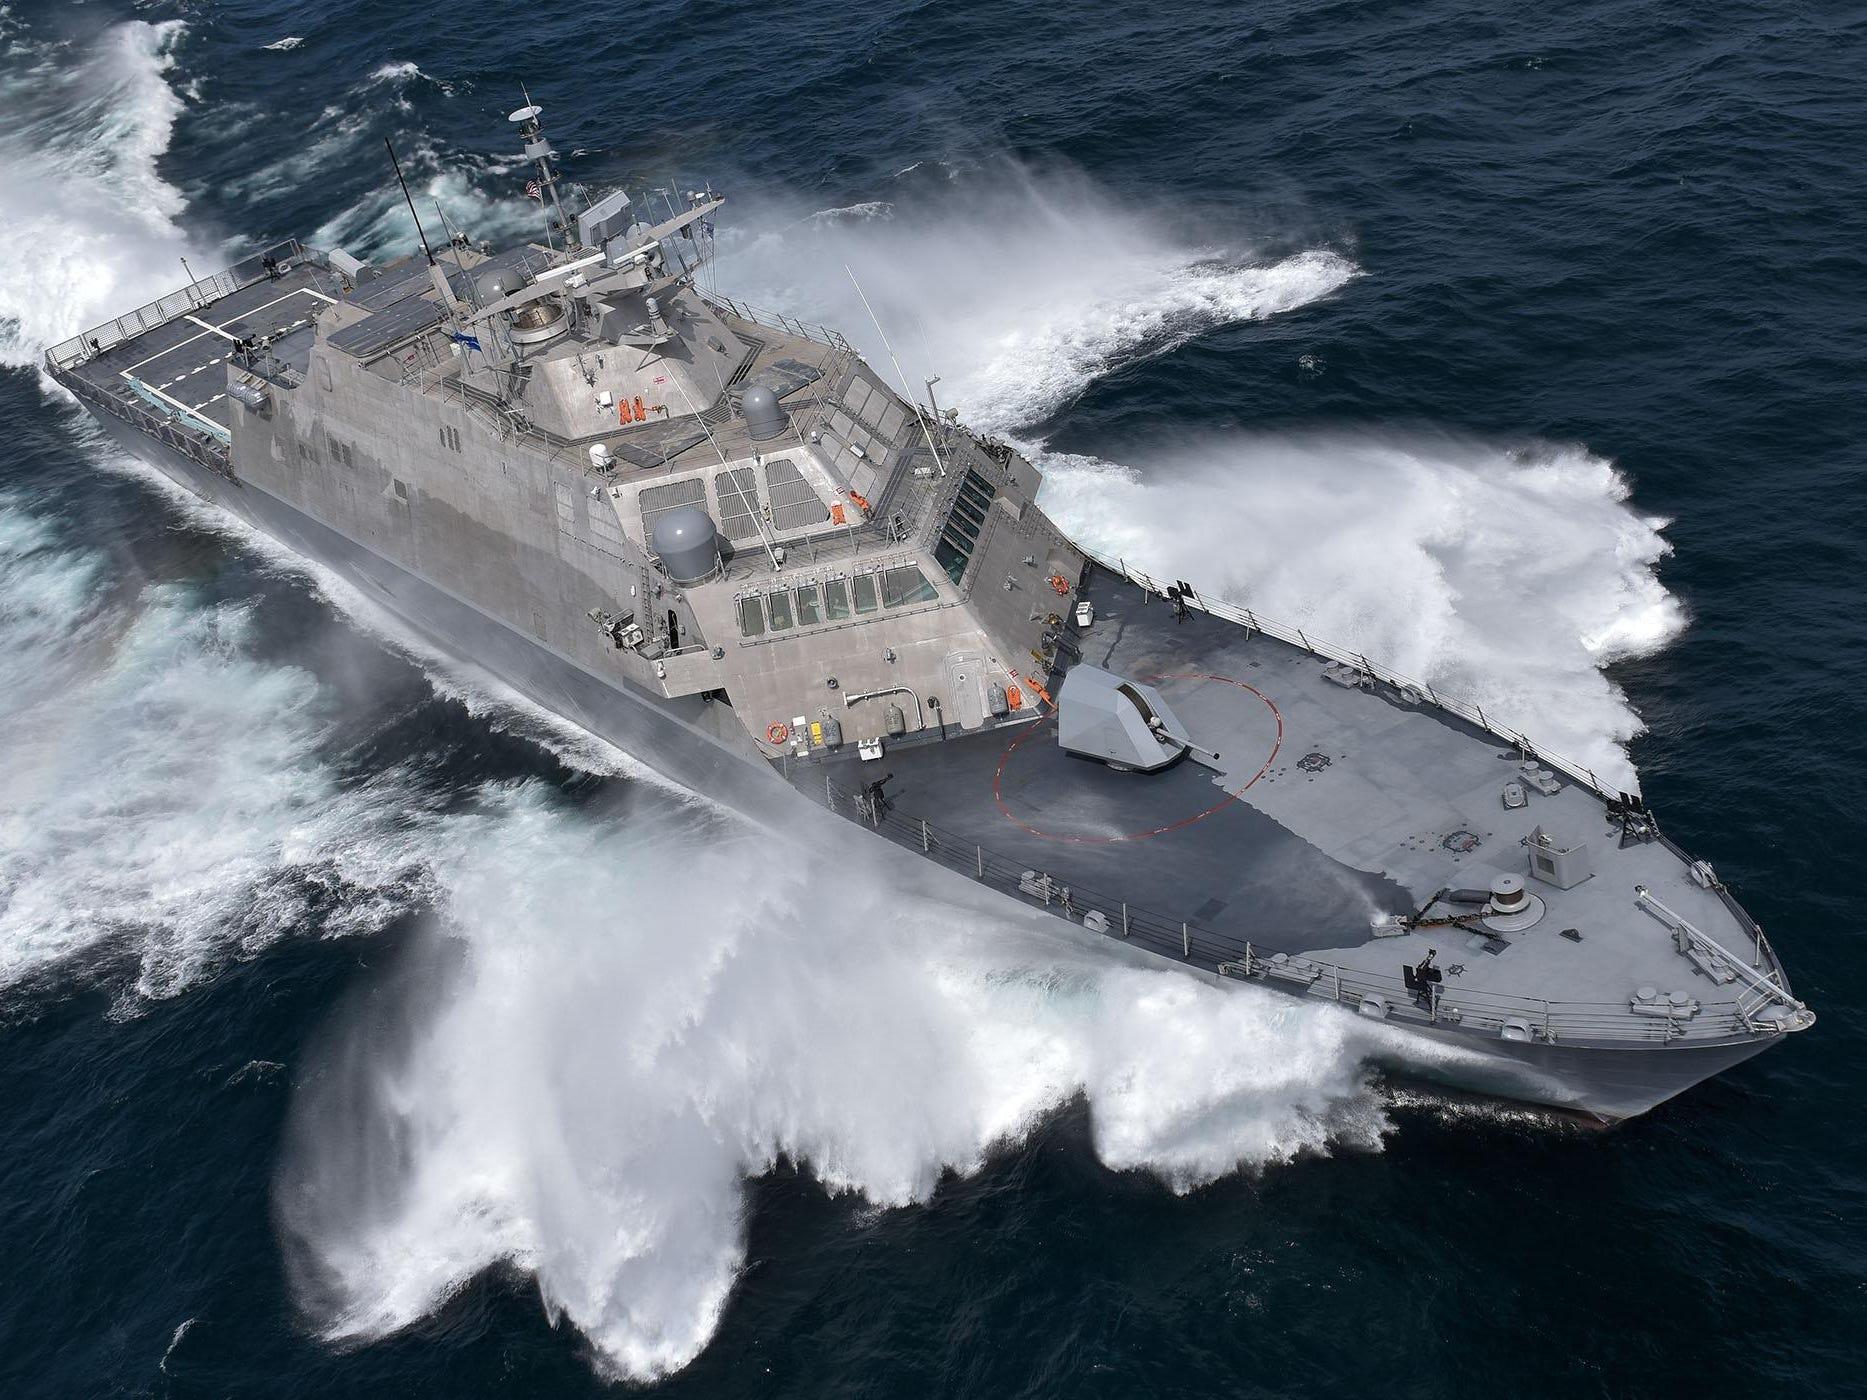 6th USS Detroit